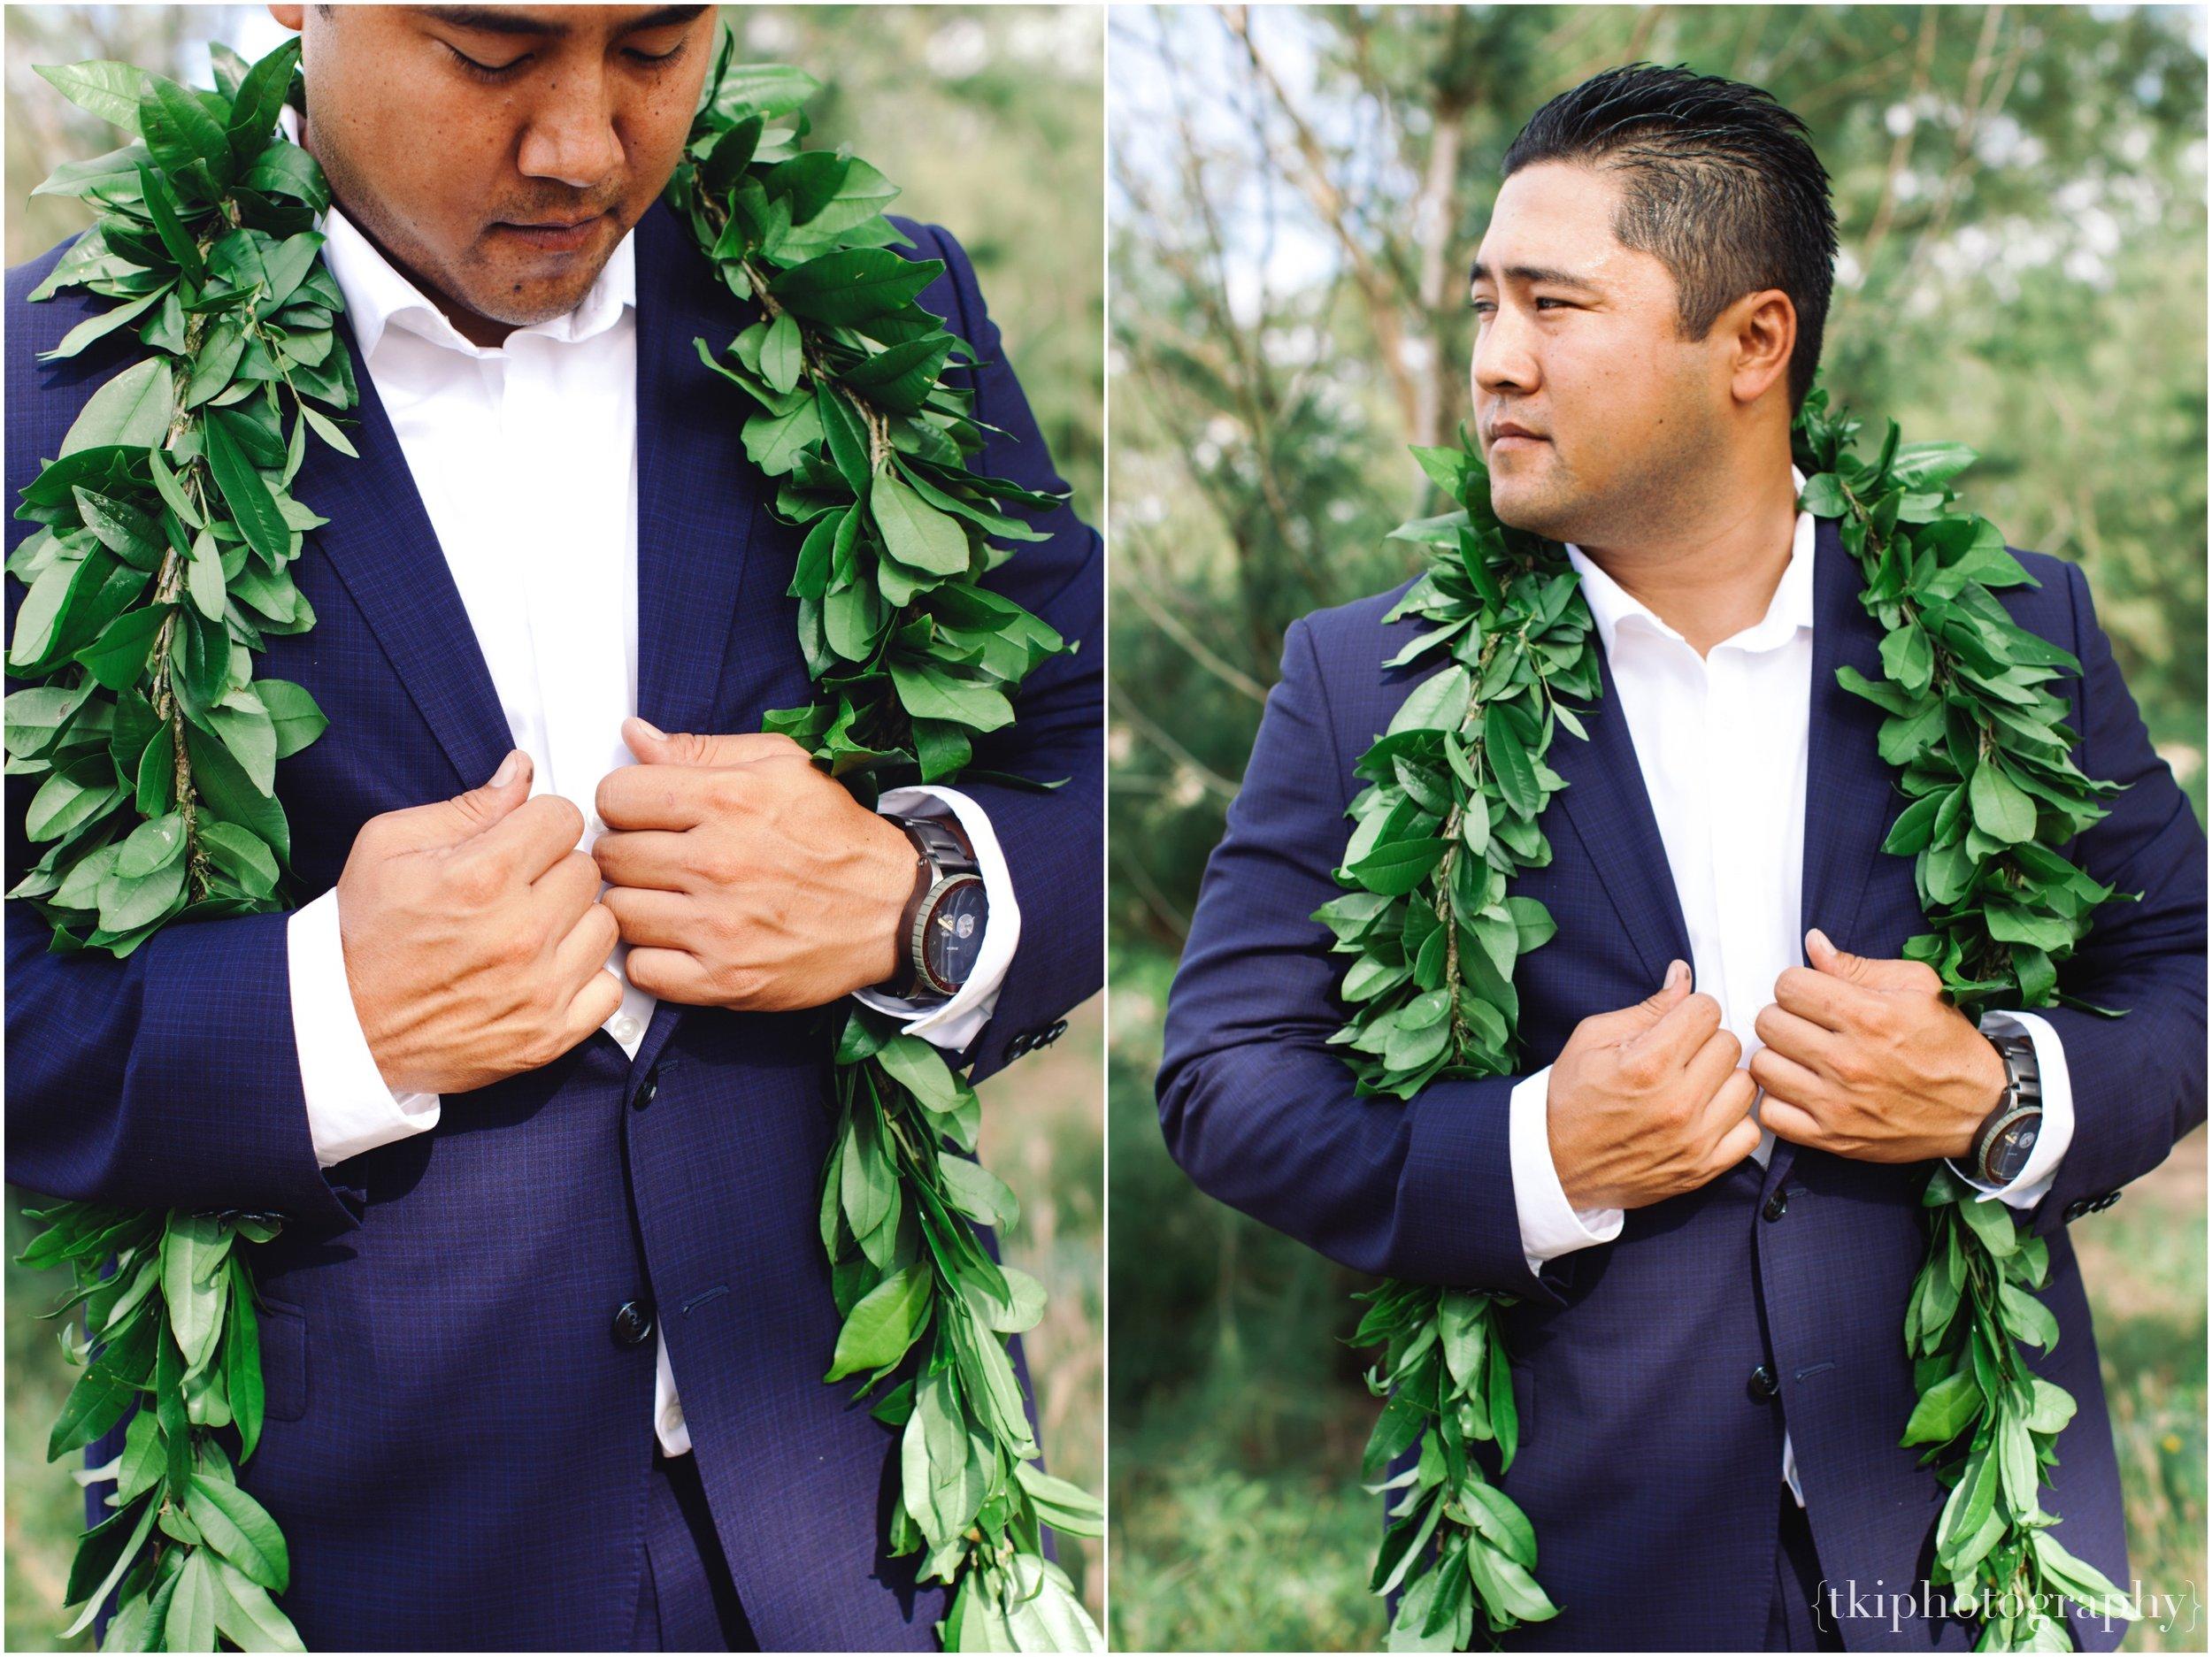 Oahu-Destination-Wedding-Beach_0095.jpg